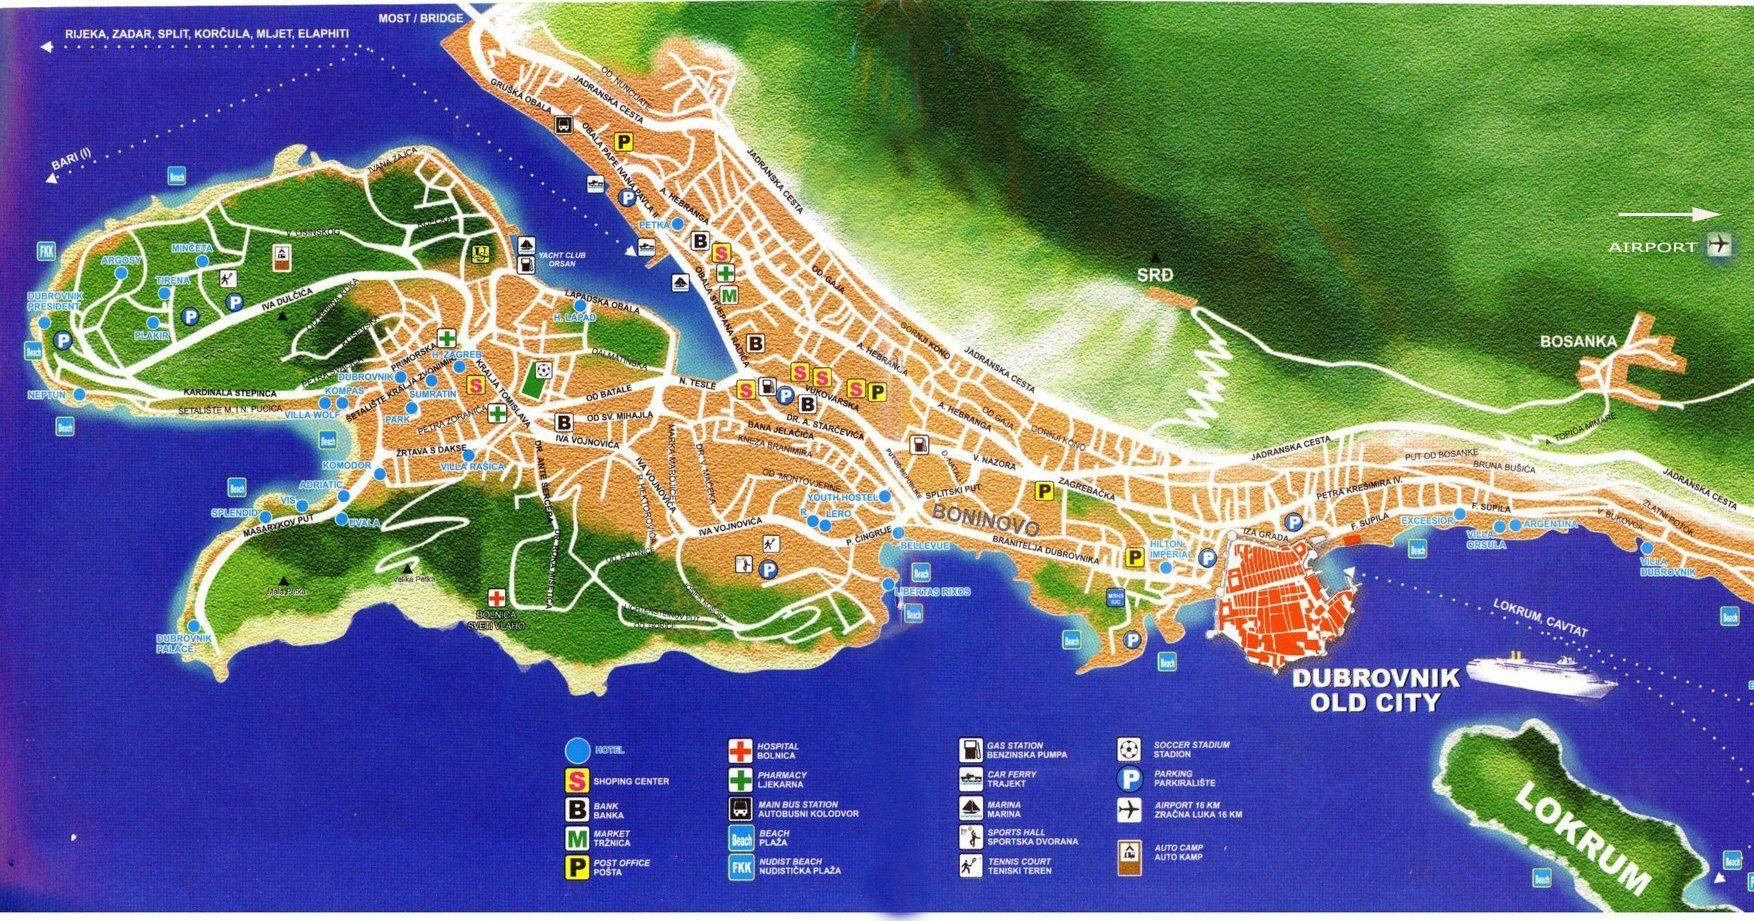 Dubrovnik Map Jpg 1754 921 Dubrovnik Map Dubrovnik Croatia